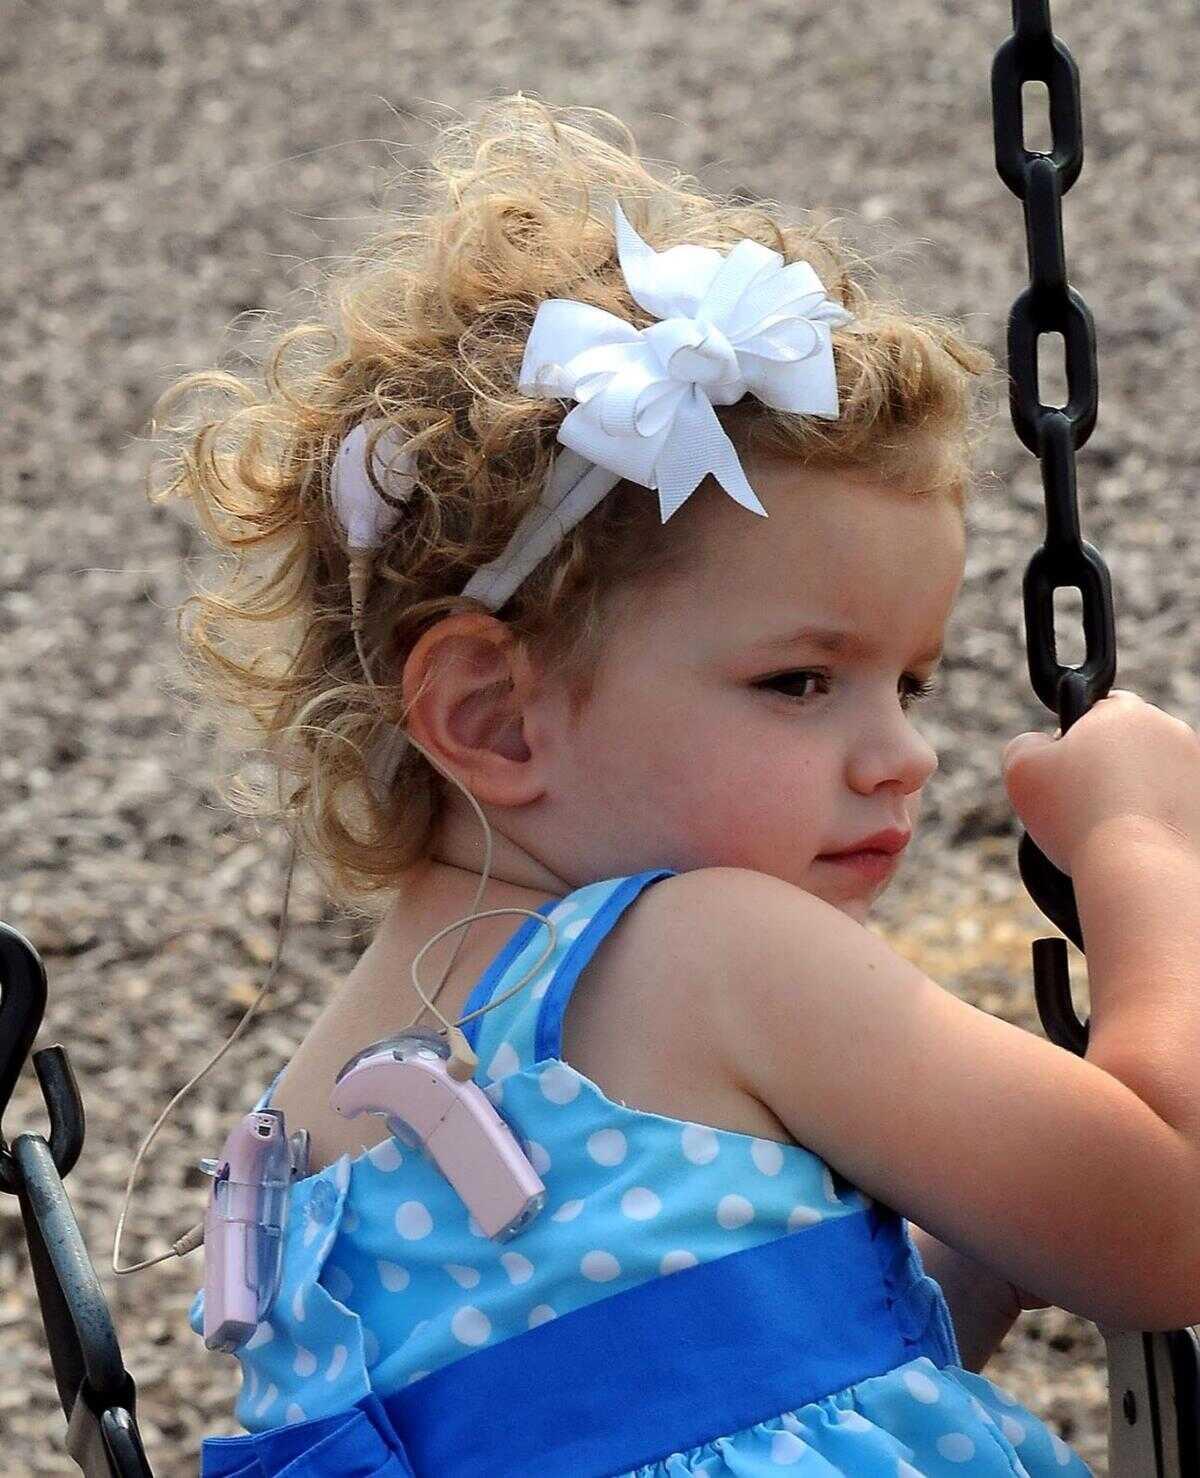 کاشت حلزون در کودکان